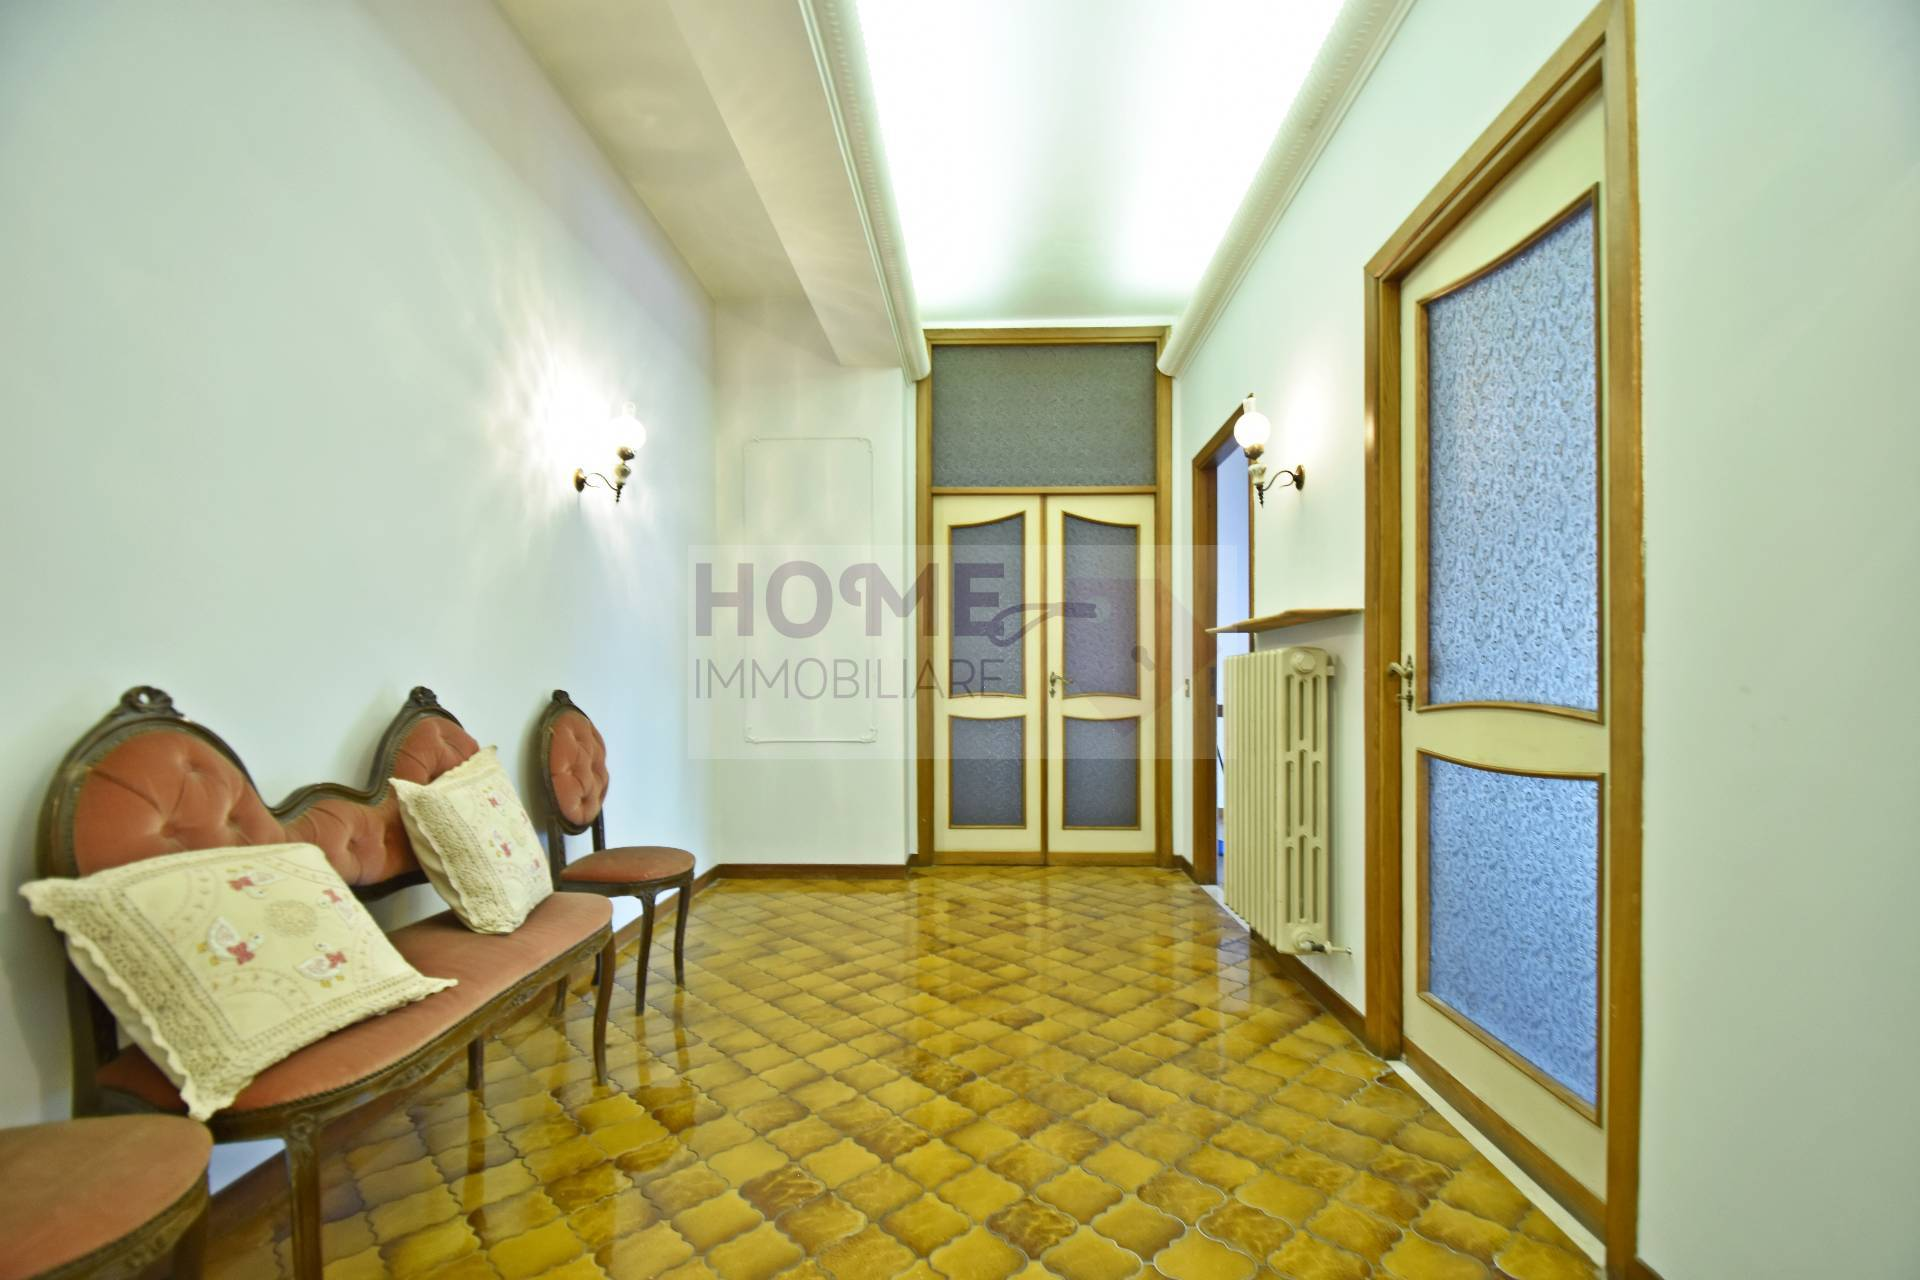 macerata vendita quart: piediripa home immobiliare srl